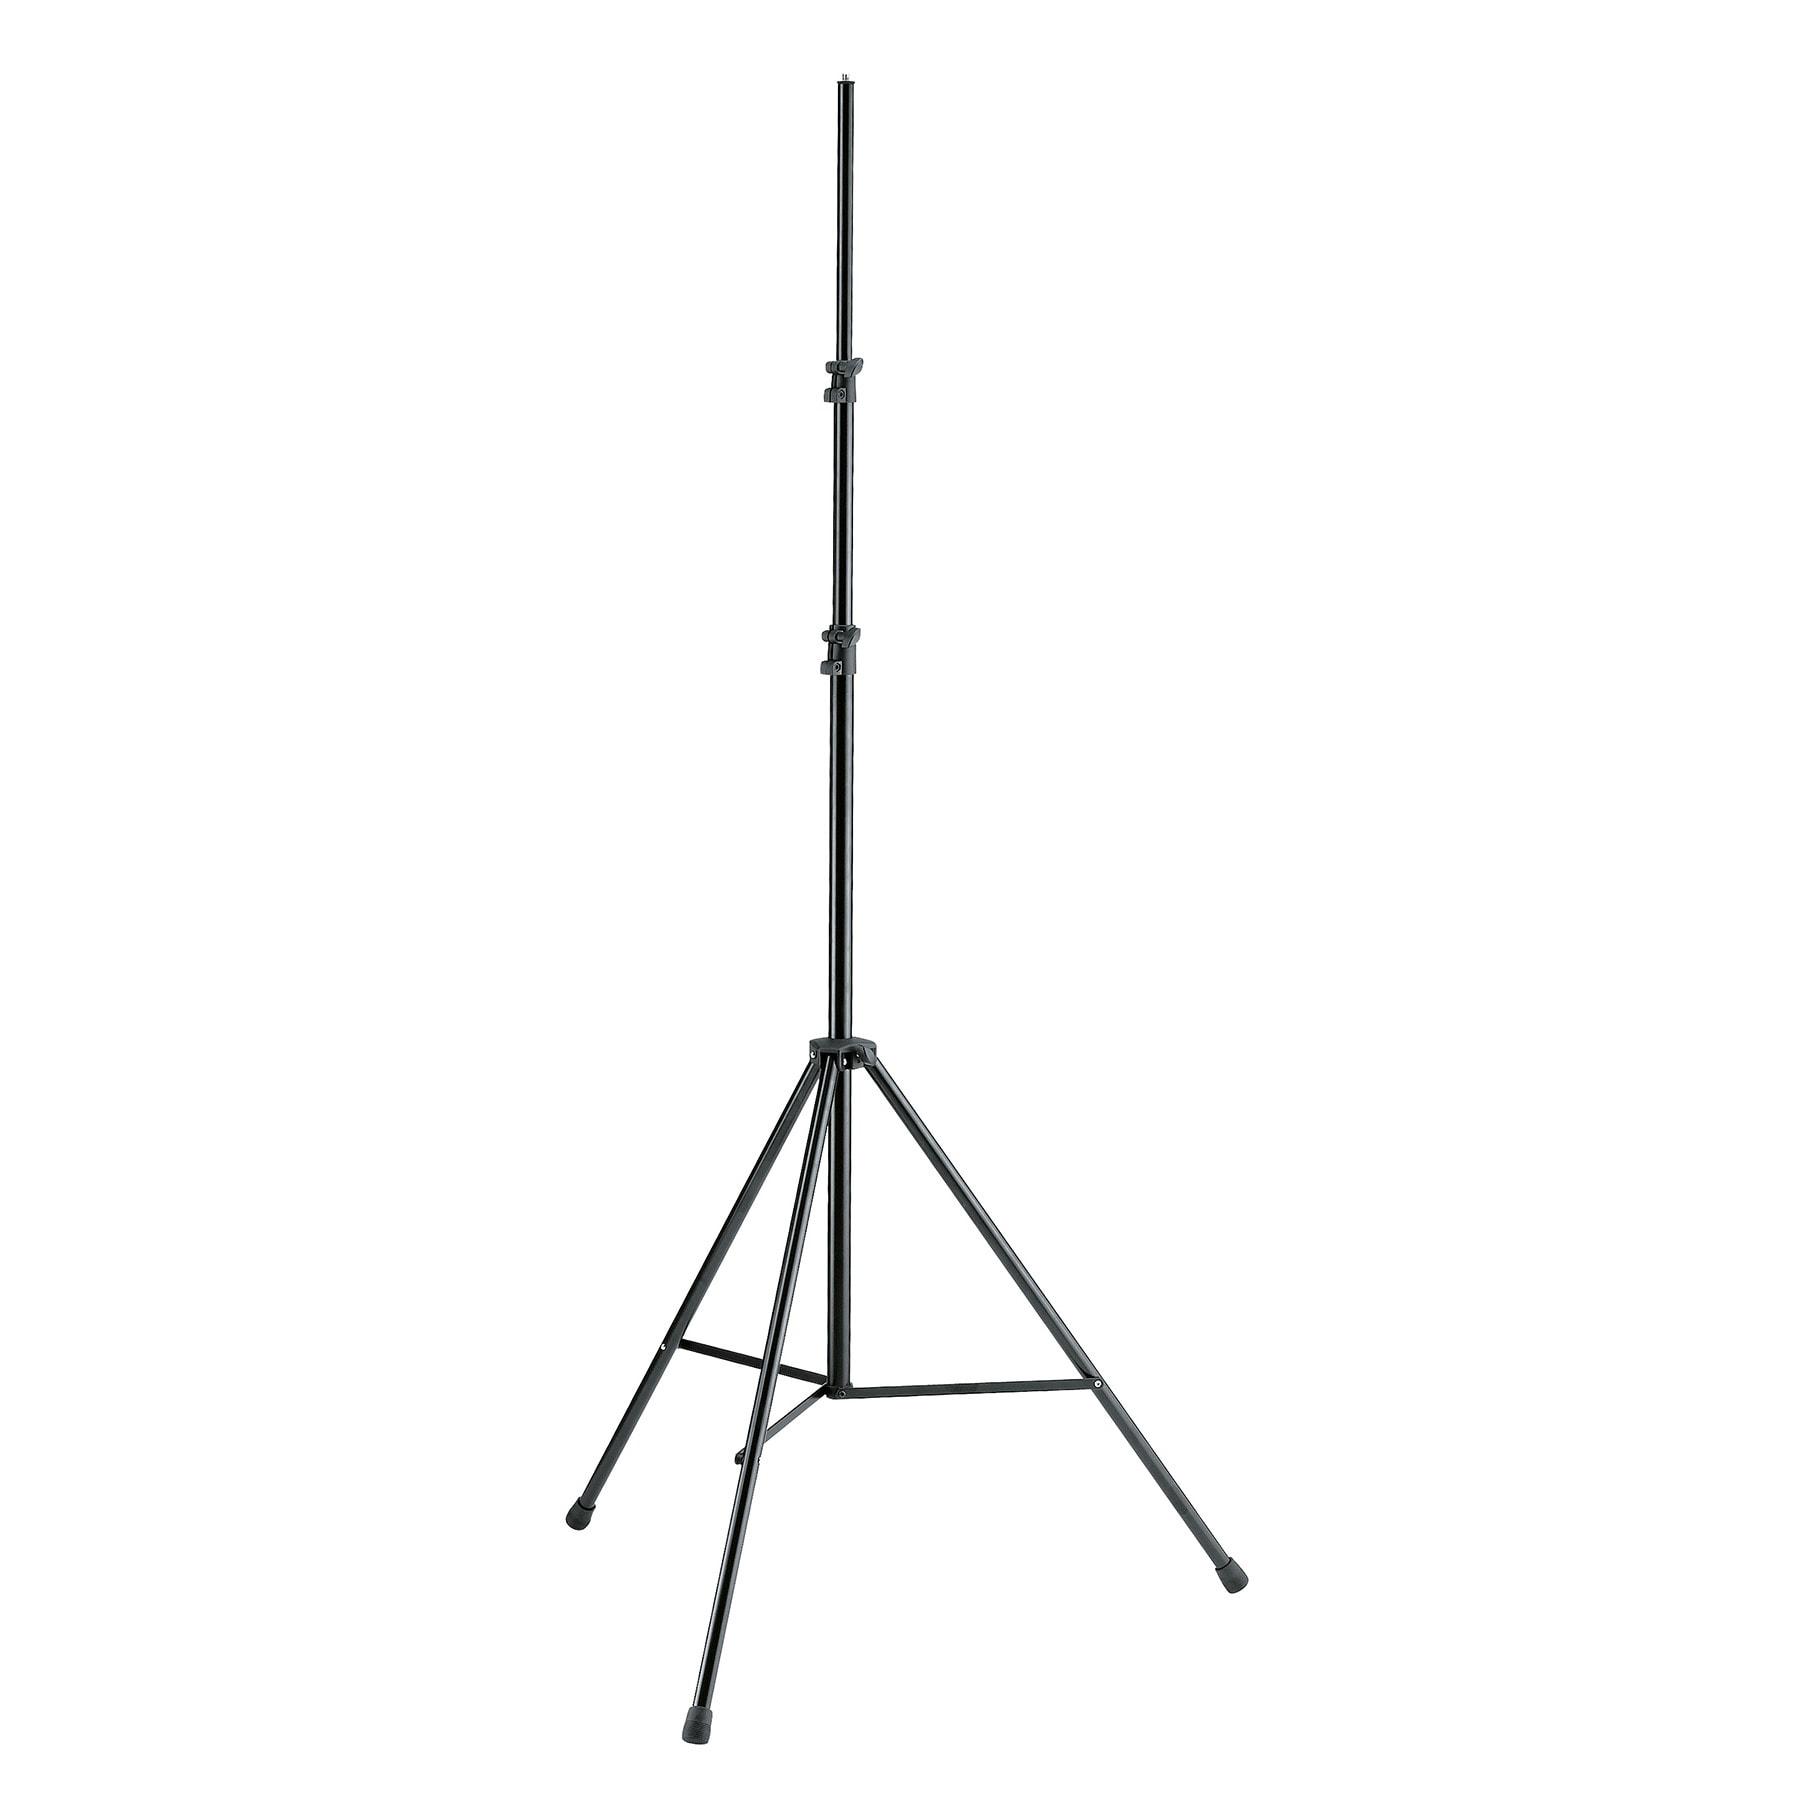 KM20800 - Overhead microphone stand